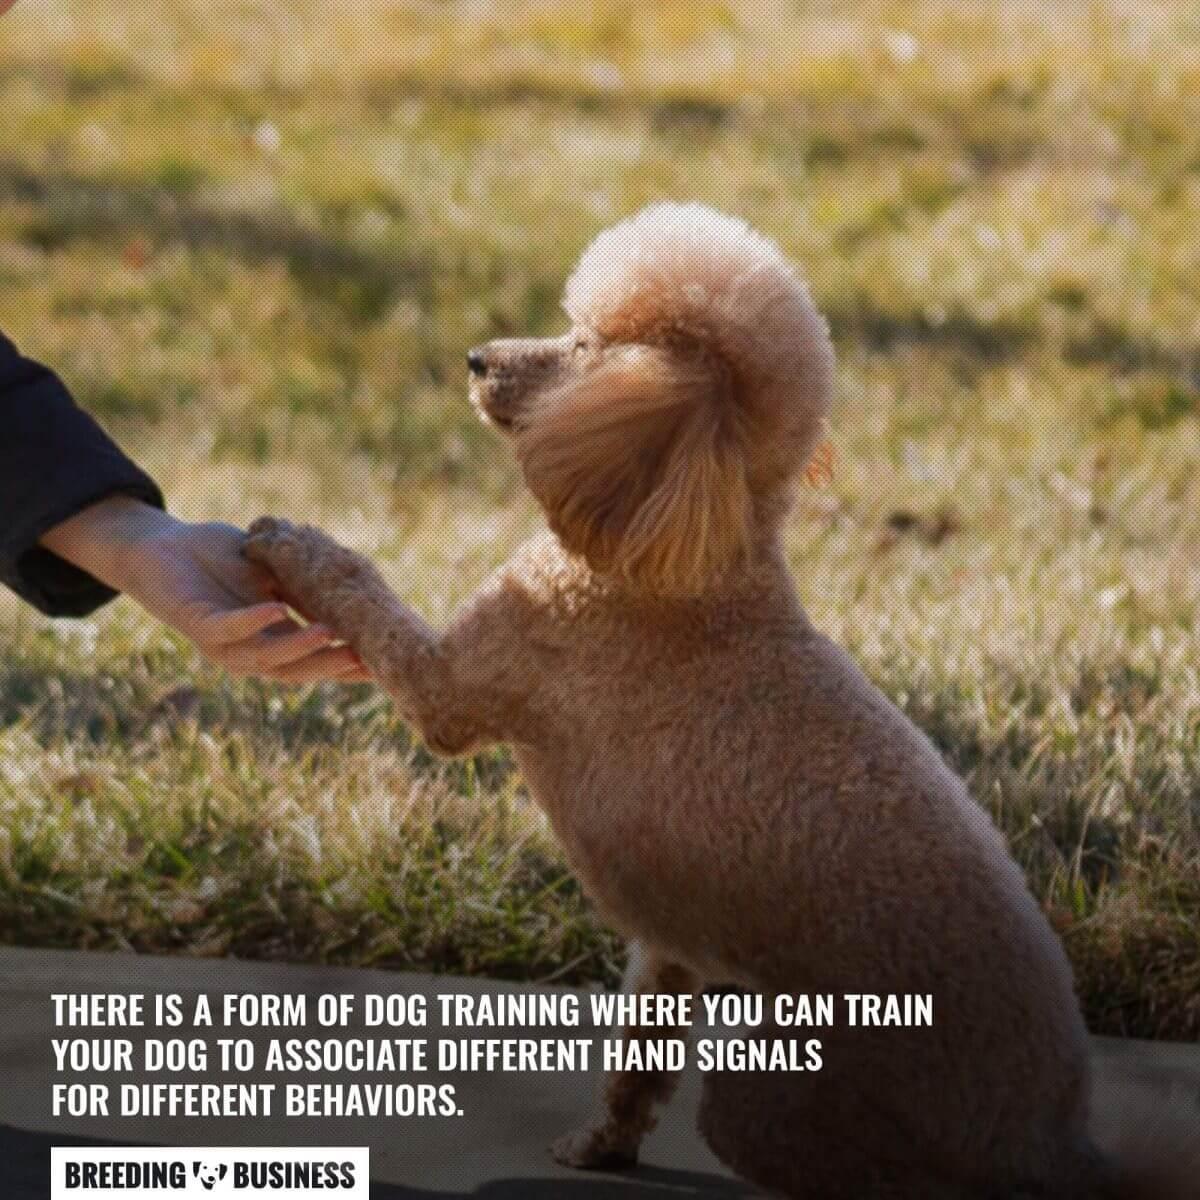 dog training using hand gestures